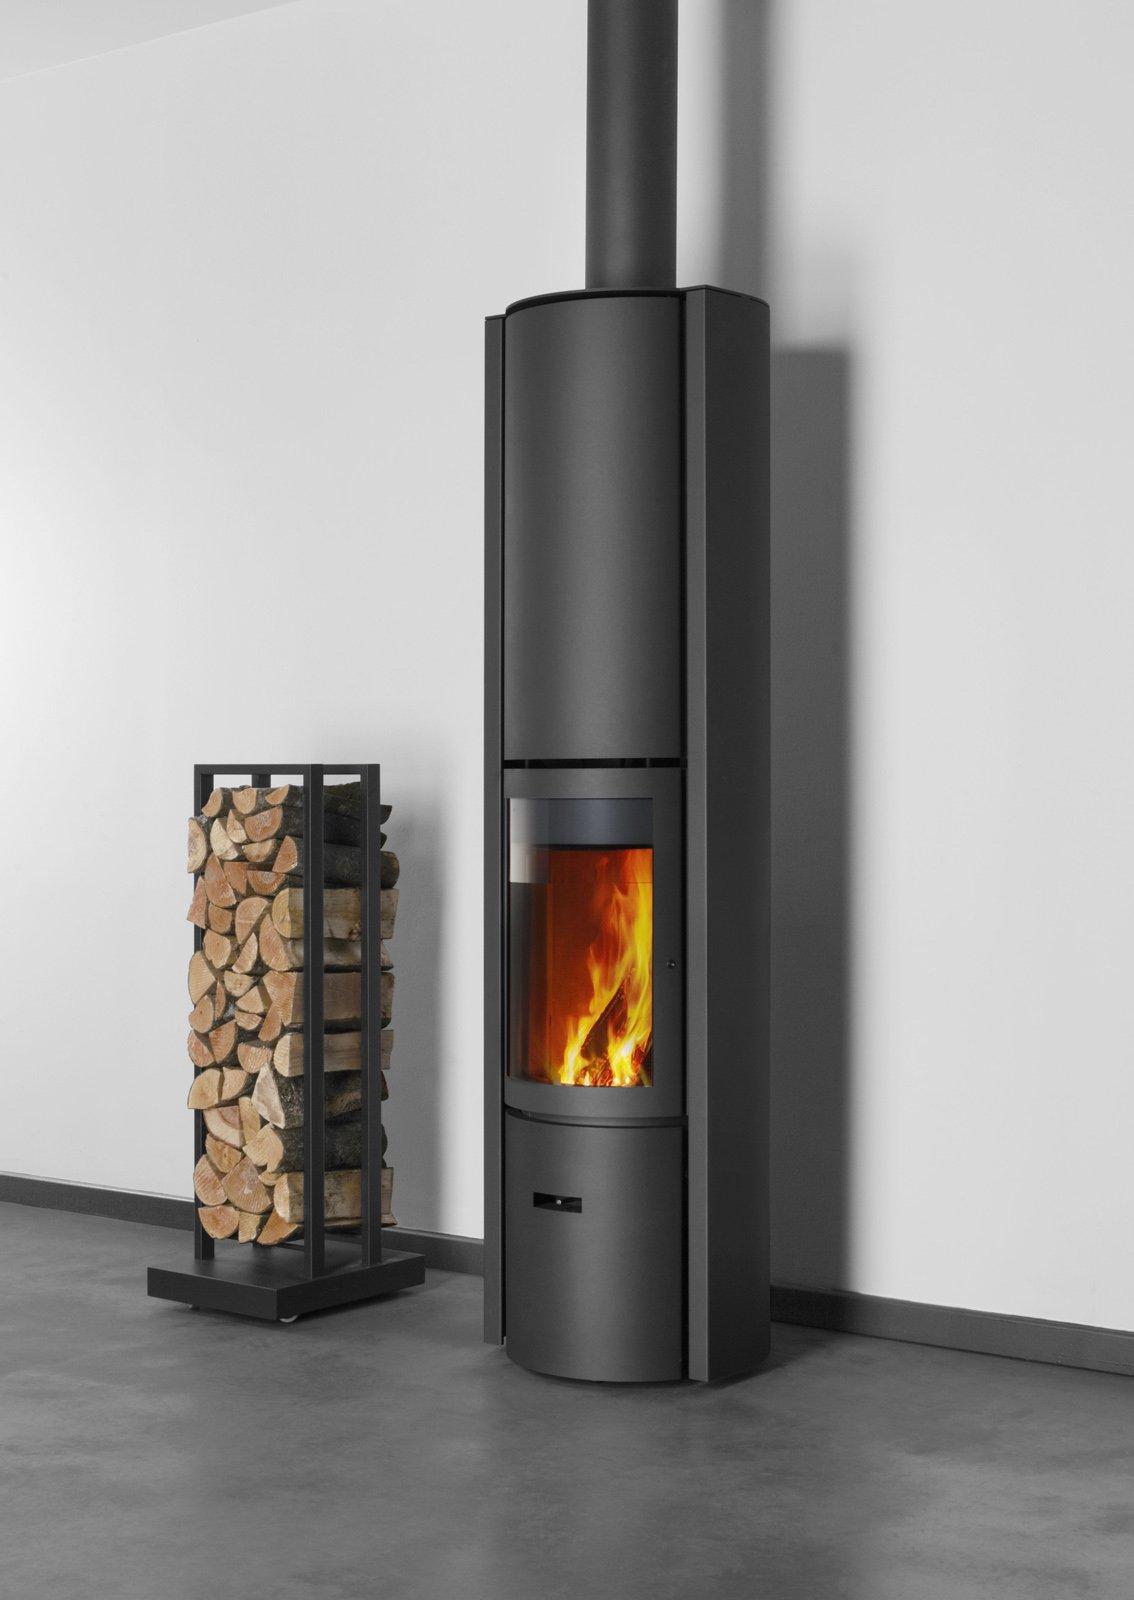 Stufe ad accumulo per un calore a lunga durata cose di casa - Stufa ad accumulo prezzi ...